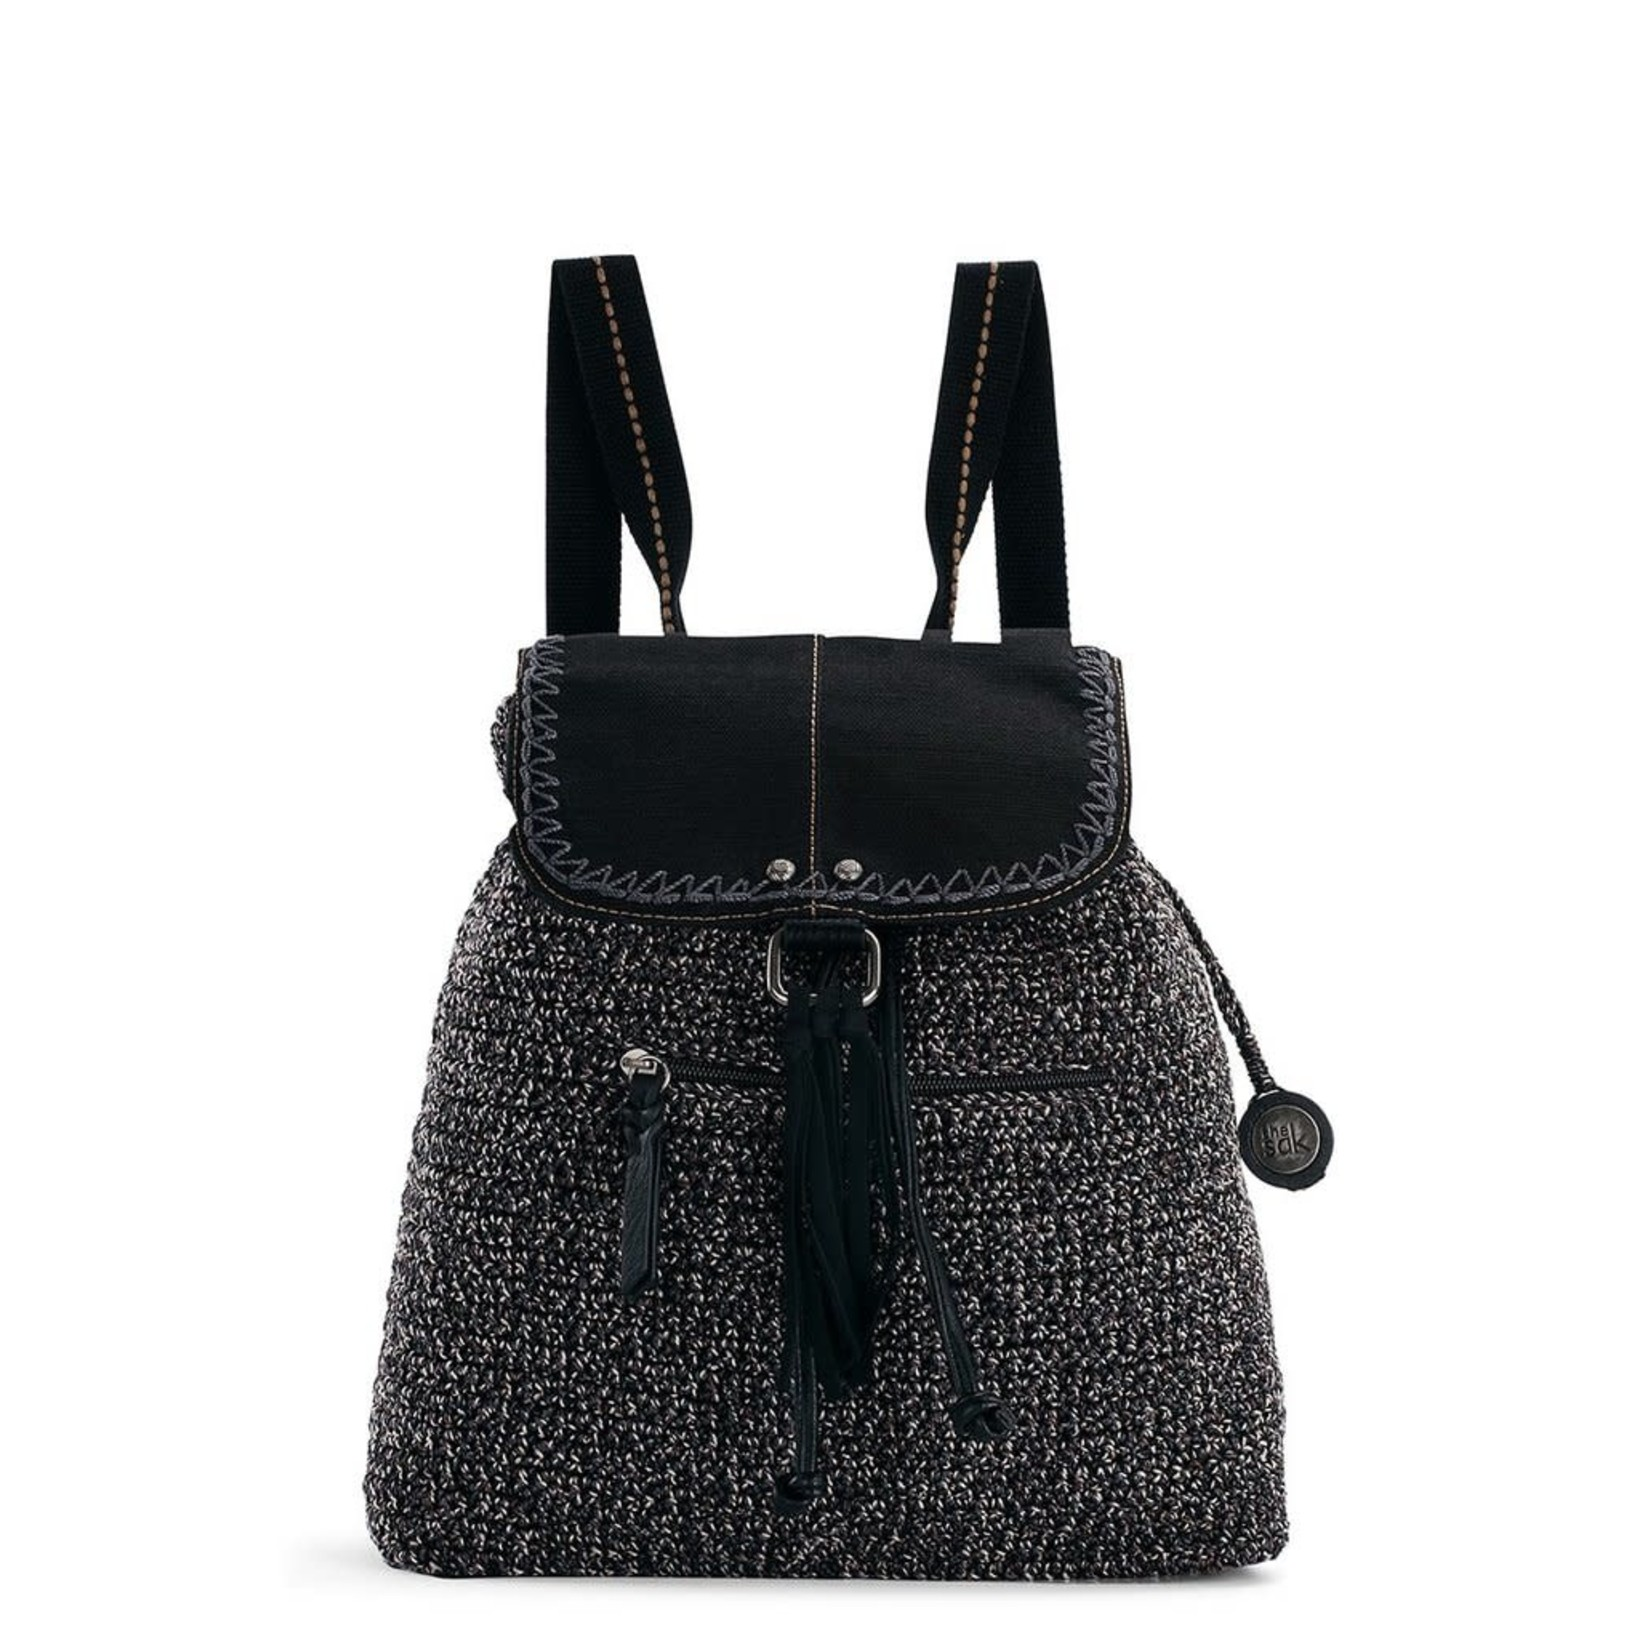 The Sak Avalon Crochet Convertible Backpack - Urban Static